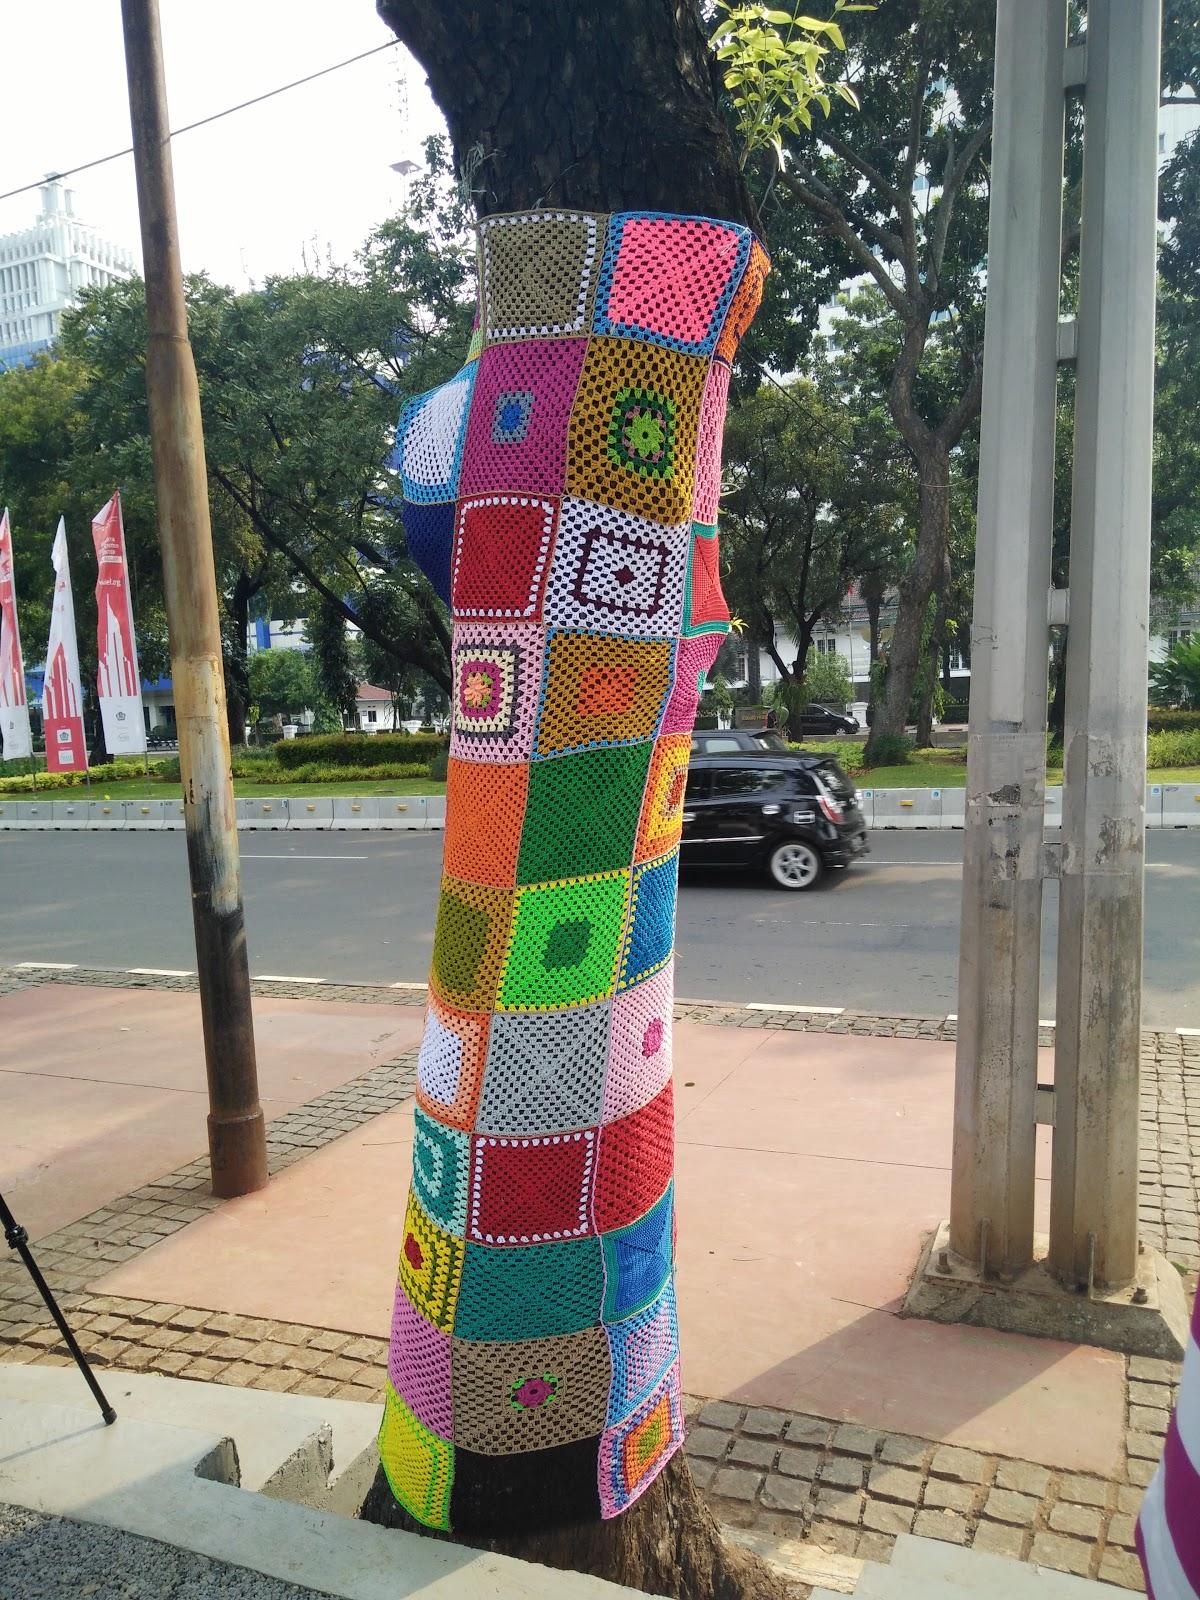 ANDIYANI ACHMAD Taman Pandang Istana Solusi Inovatif Holcim